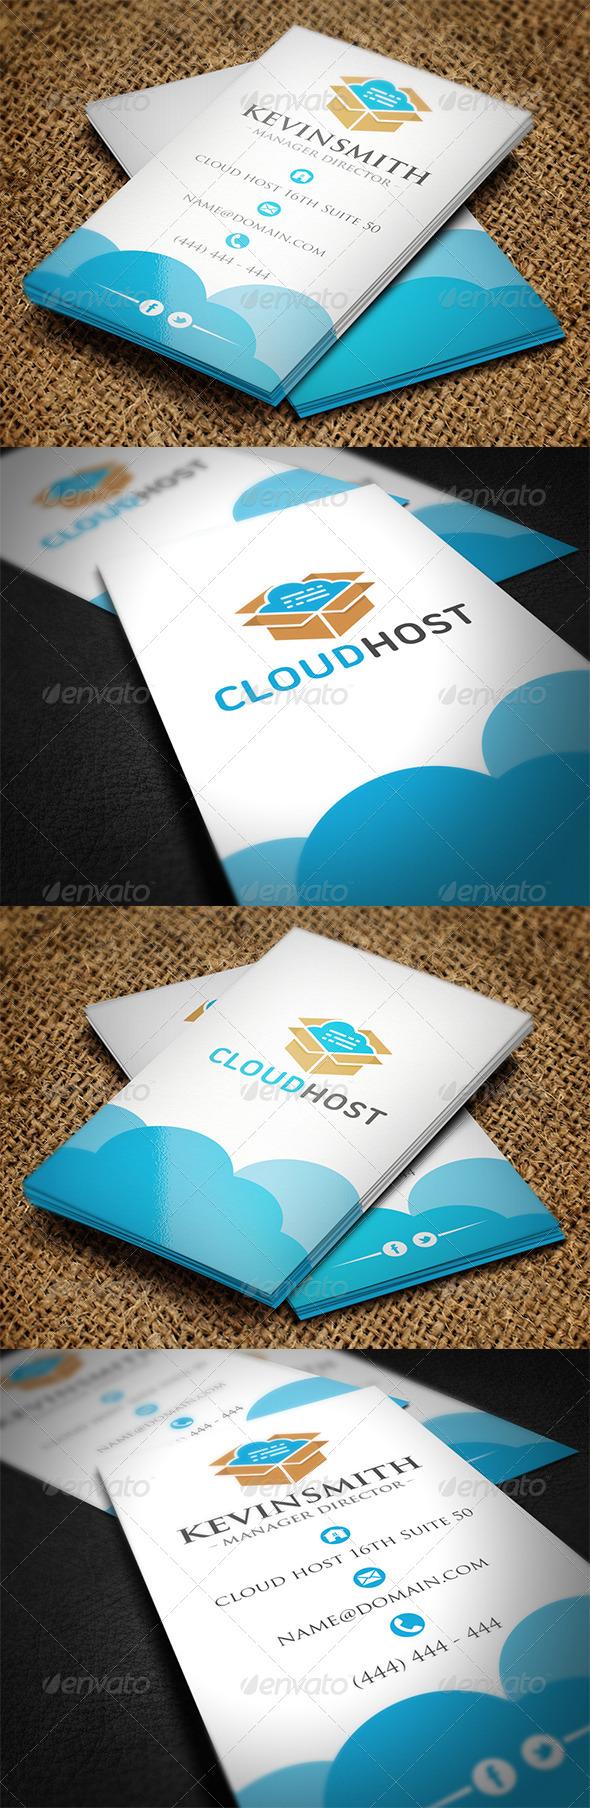 Cloud Business Card - Creative Business Cards